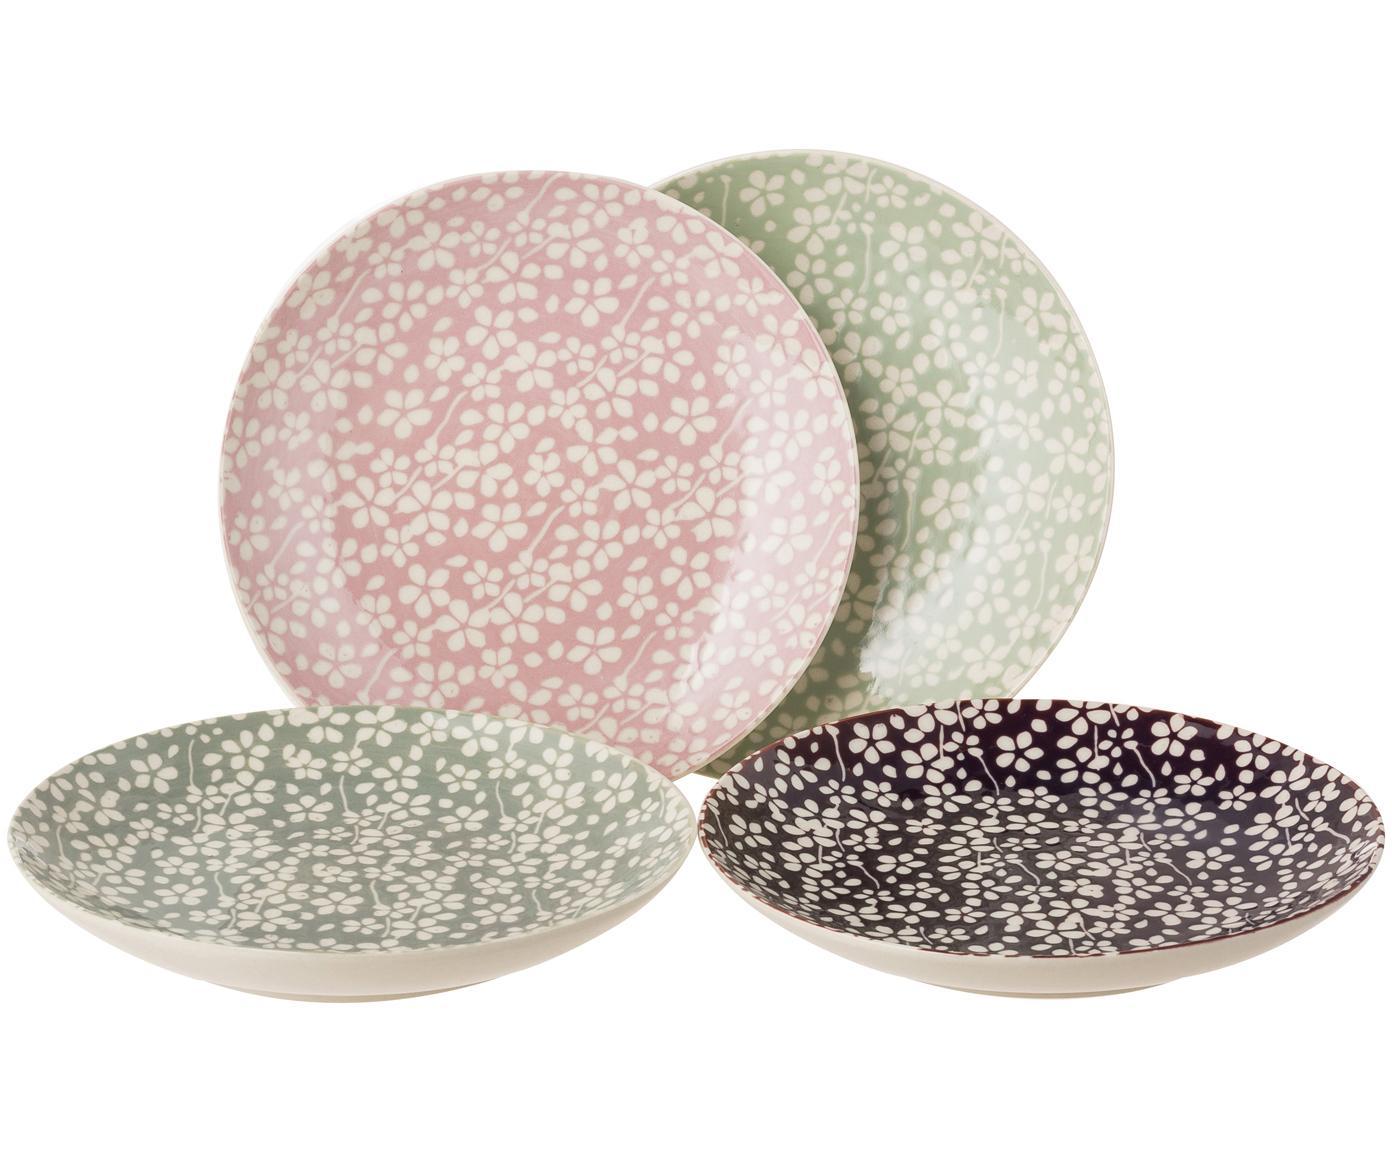 Dessertbordenset Seeke, 4-delig, Keramiek, Laurier, rookblauw, pruimkleurig, mauve, crèmekleurig, Ø 15 cm